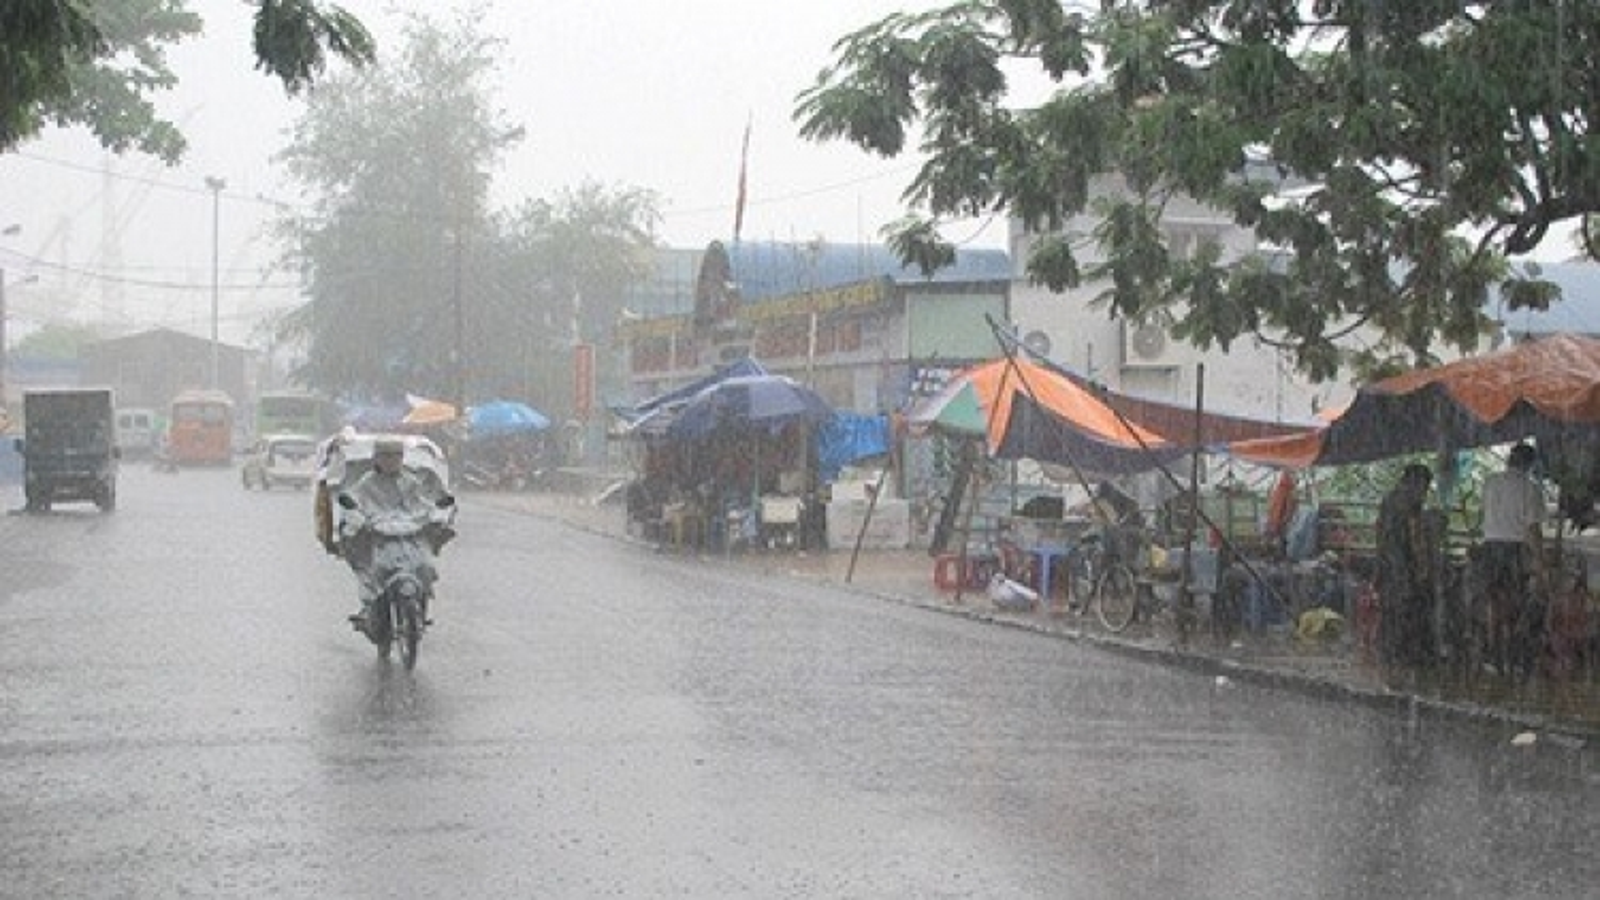 Three-day rain in northern region, flooding feared